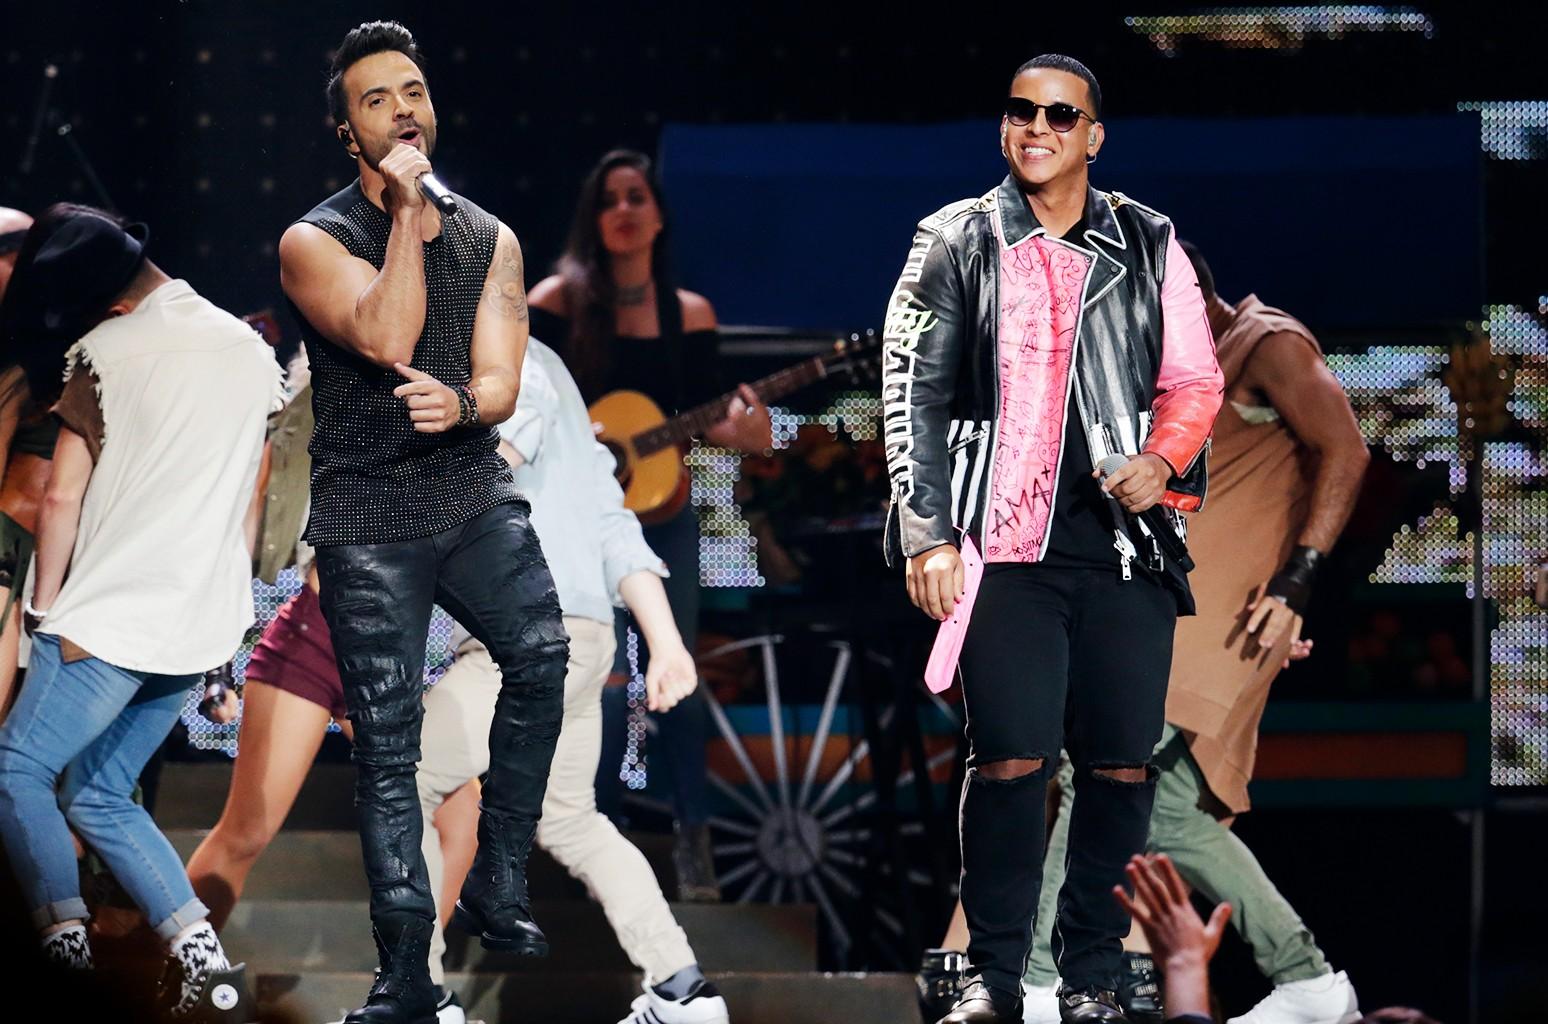 Luis Fonsi & Daddy Yankee, 2017